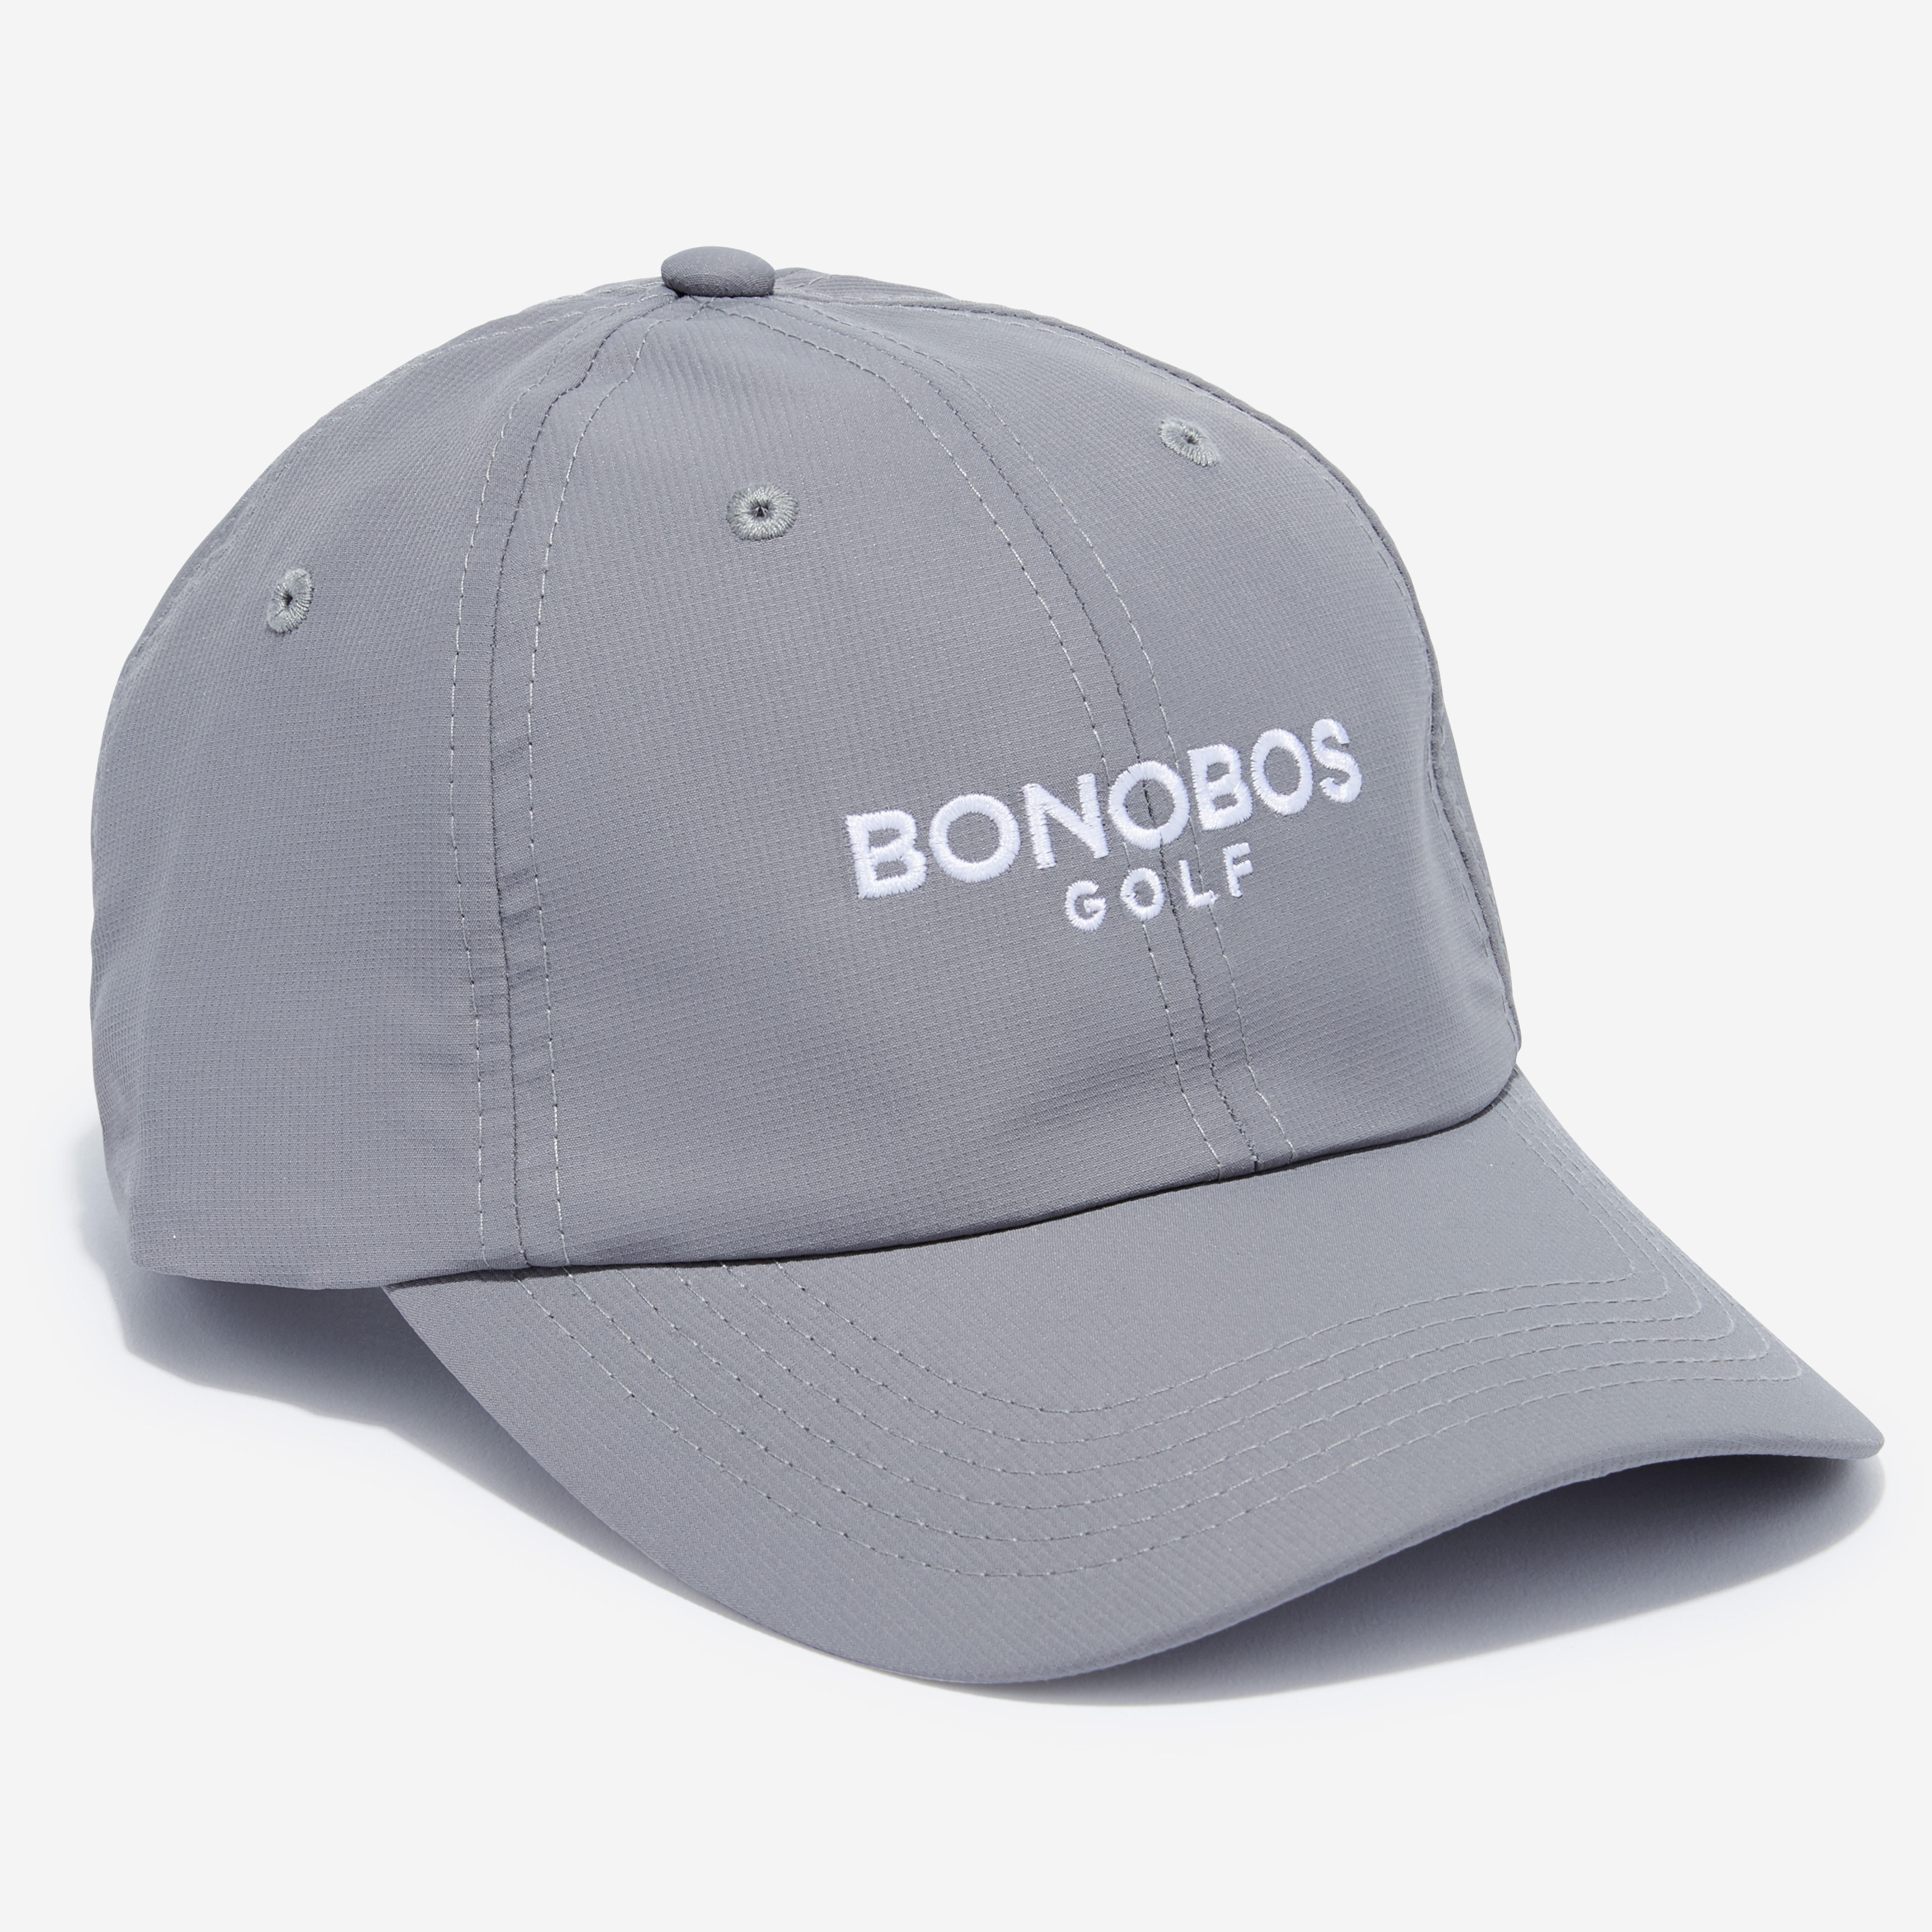 Bonobos Golf Hat